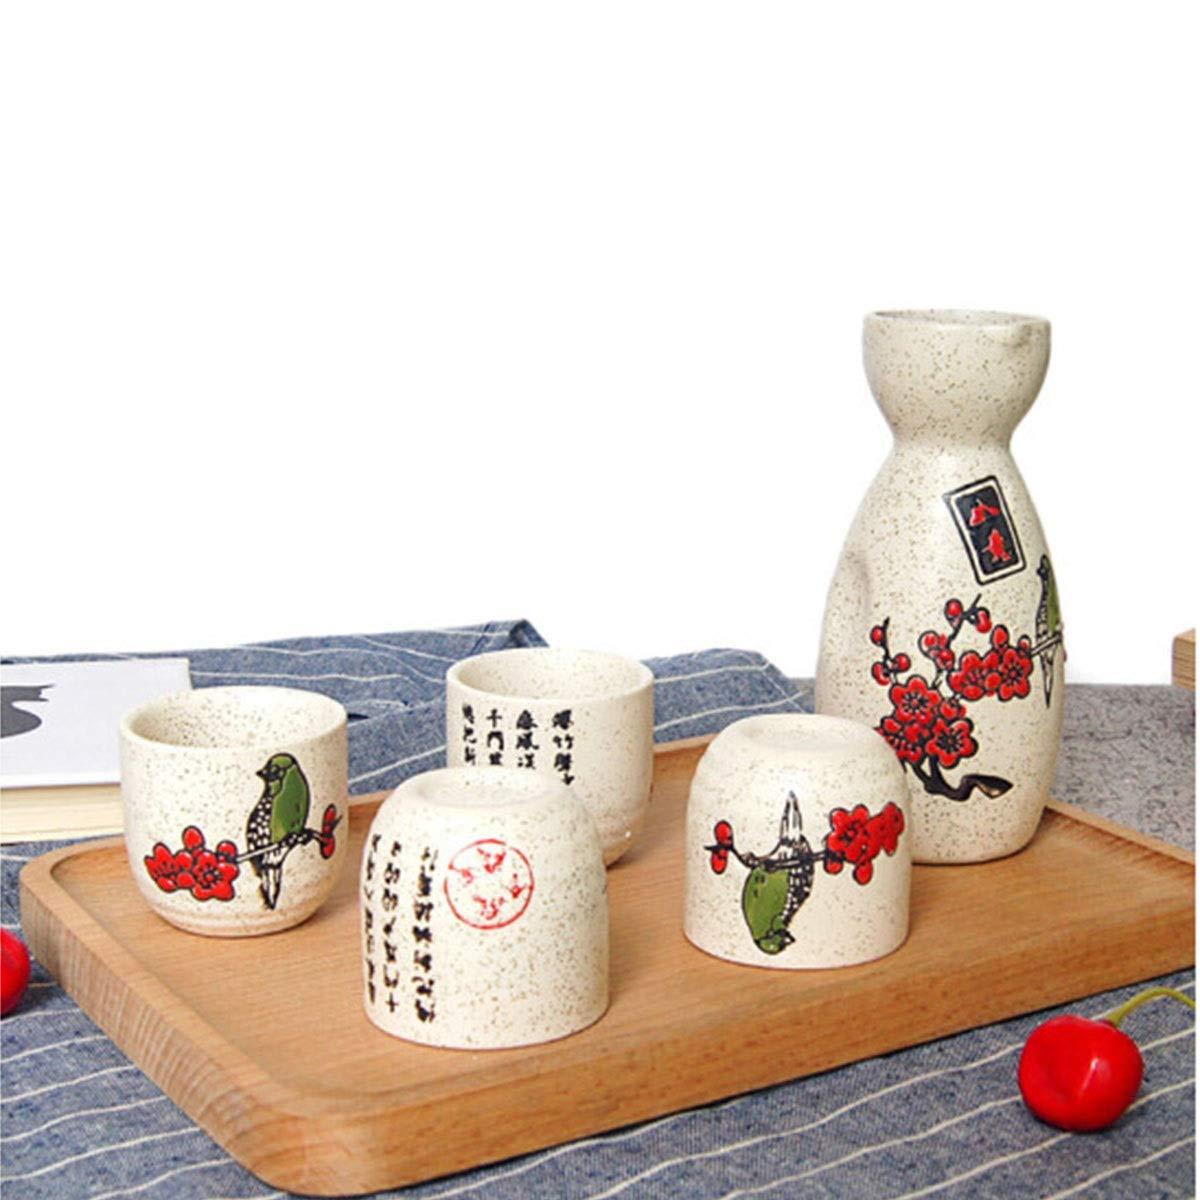 Wine Glass Wine Wine Sake Pot Hip Flask Japanese Sake Cup Beaker Sake Jug Bird Set Fashion Wine MINGSHENGWANGLUO Flagon 5 Piece Gift Box Home kitchen Wine Household Liquor Ceramic